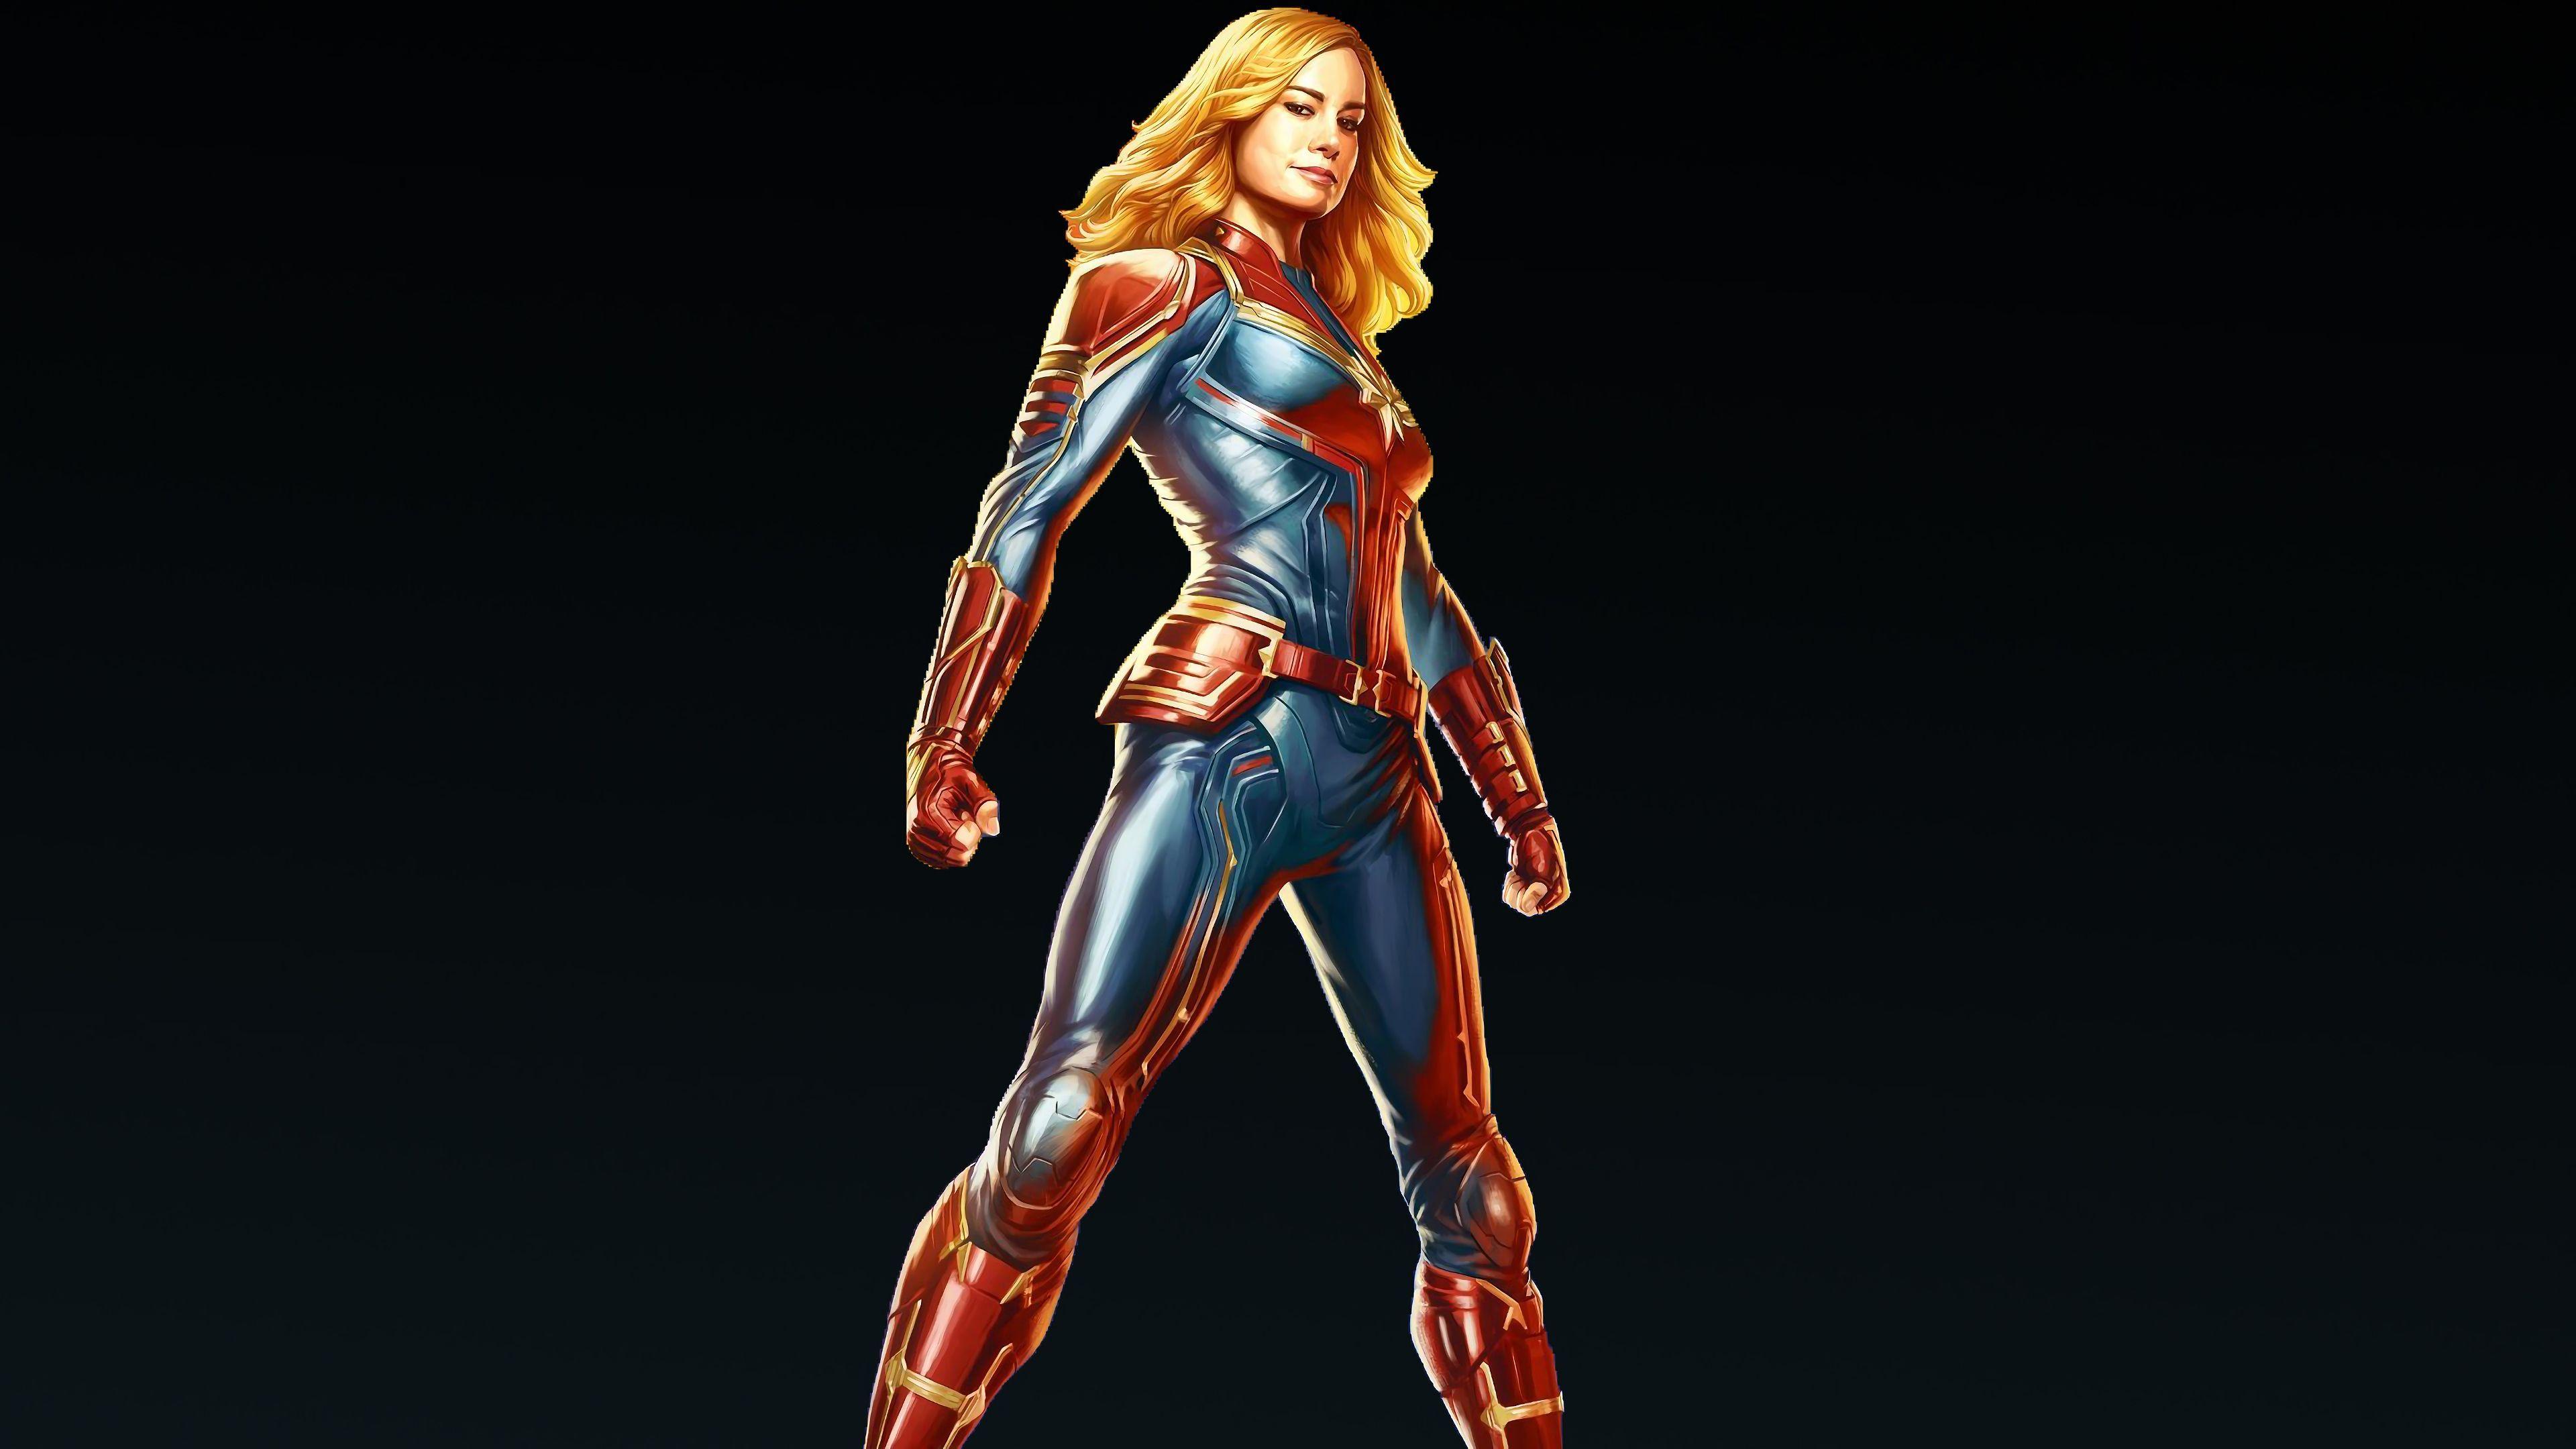 Captain Marvel Fantasy Art Wallpapers Hd Desktop And: Captain Marvel Carol Danvers 4k Superheroes Wallpapers, Hd